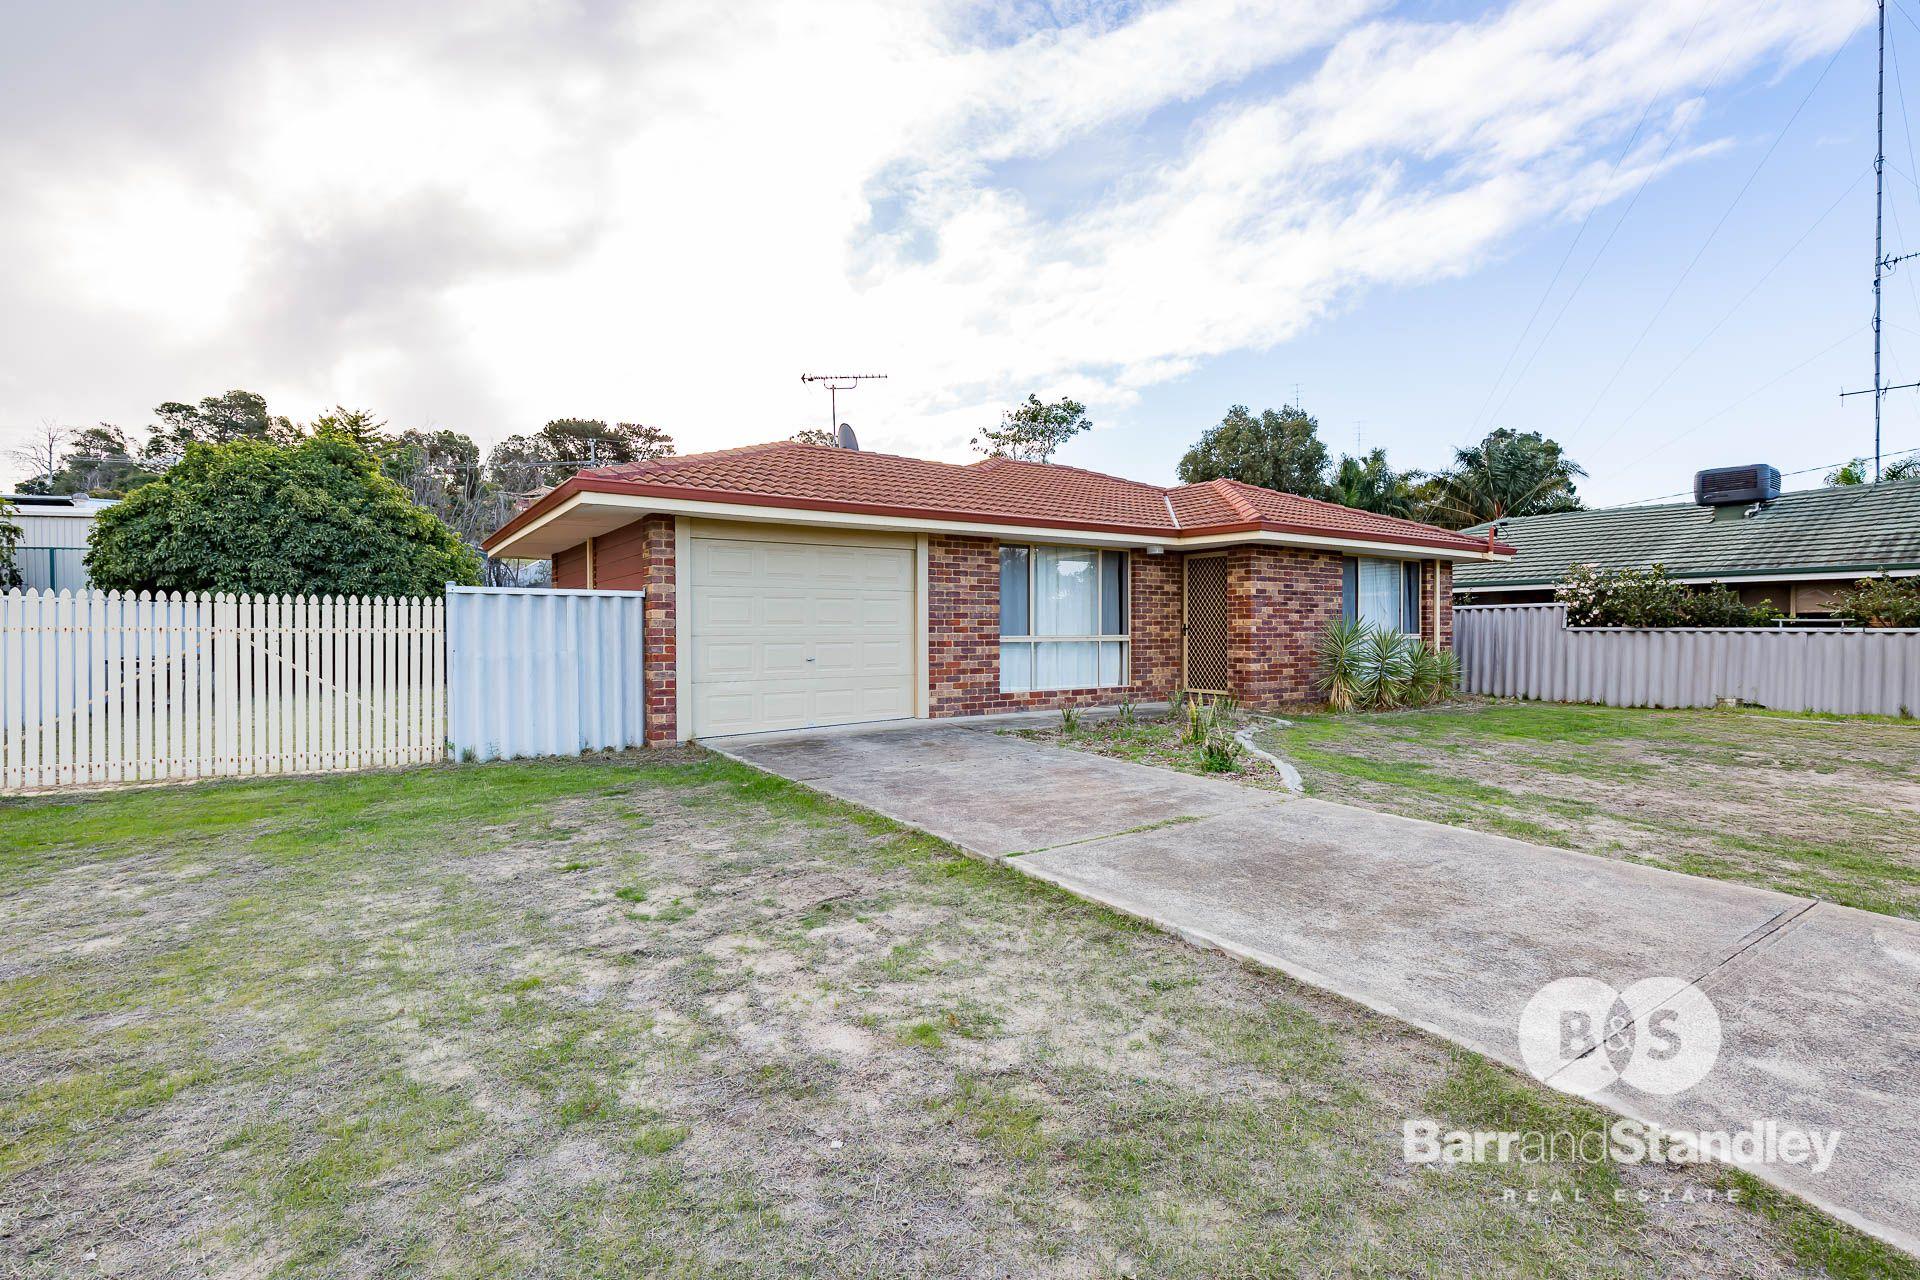 24 Brotherton Way, Australind